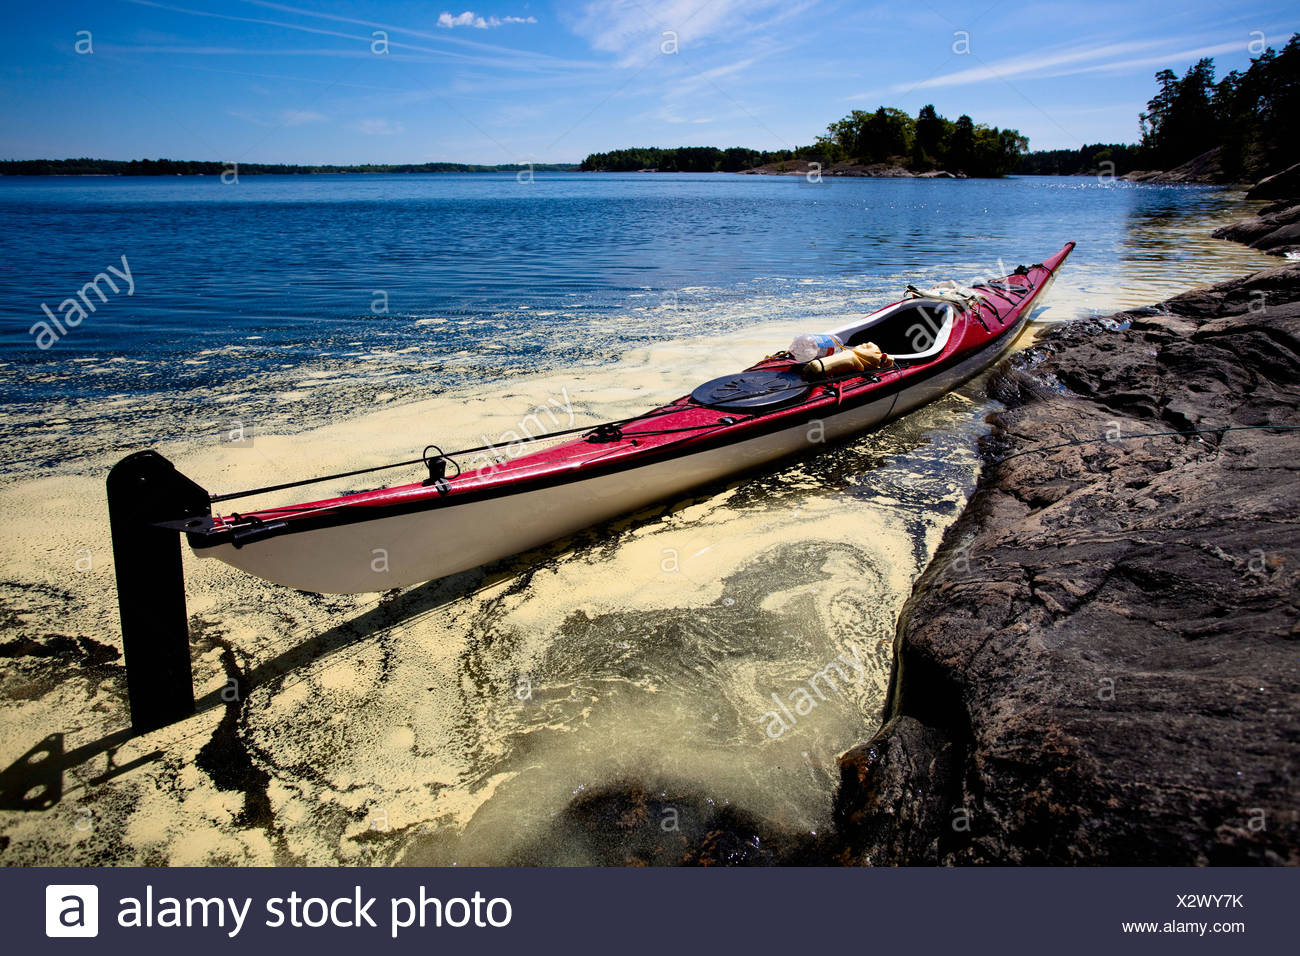 Kayak on shore - Stock Image